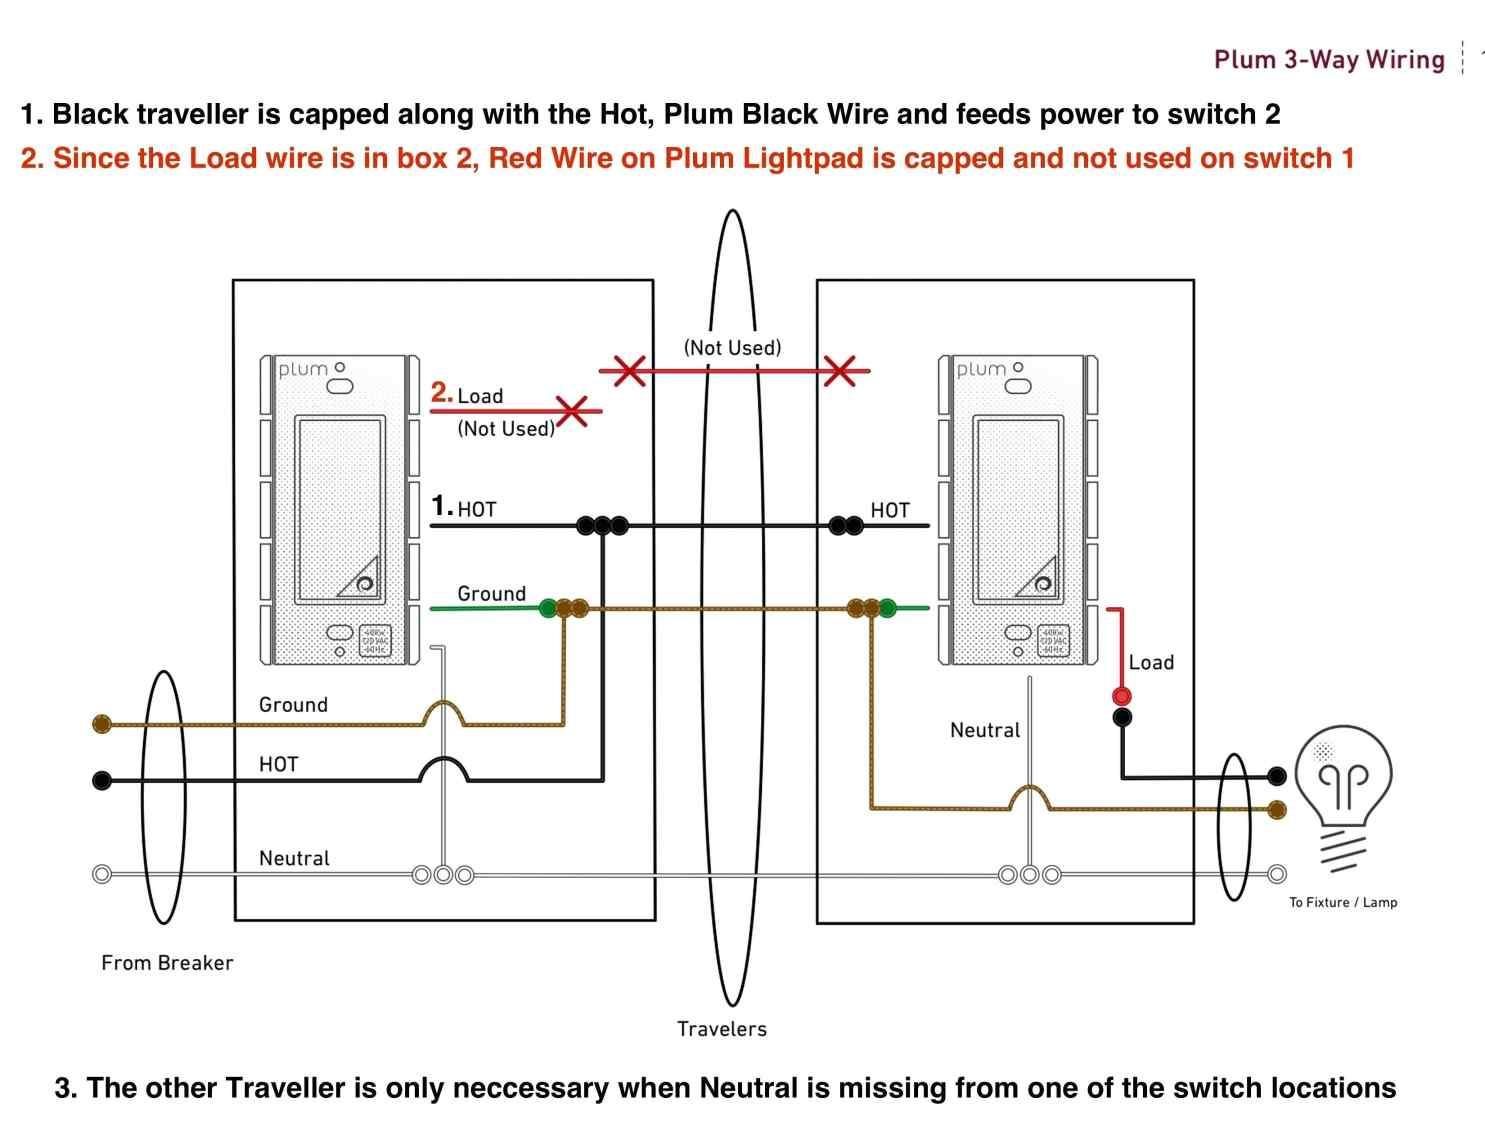 hight resolution of lutron maestro wireless wiring diagram download wiring diagram 3 way switch new wiring diagram for download wiring diagram